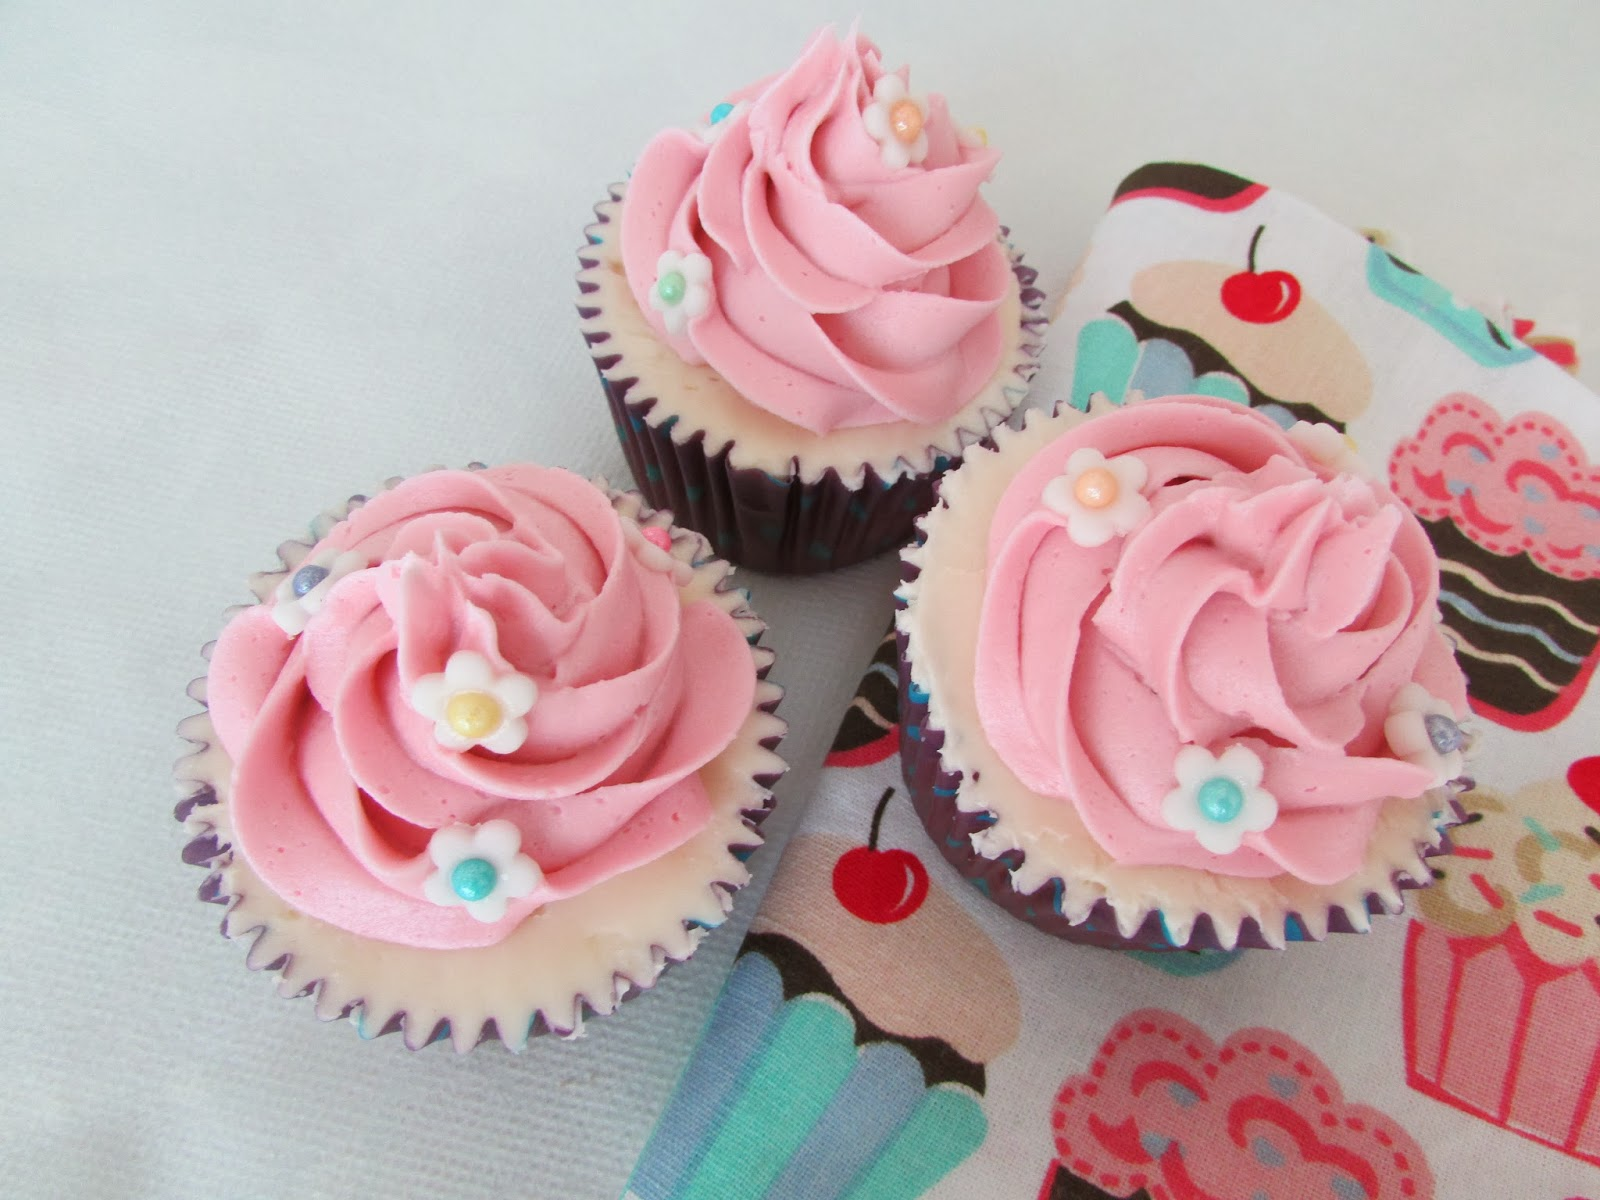 cupcakes-mexico-cdmx-amor-chocolate-oreo-galletas